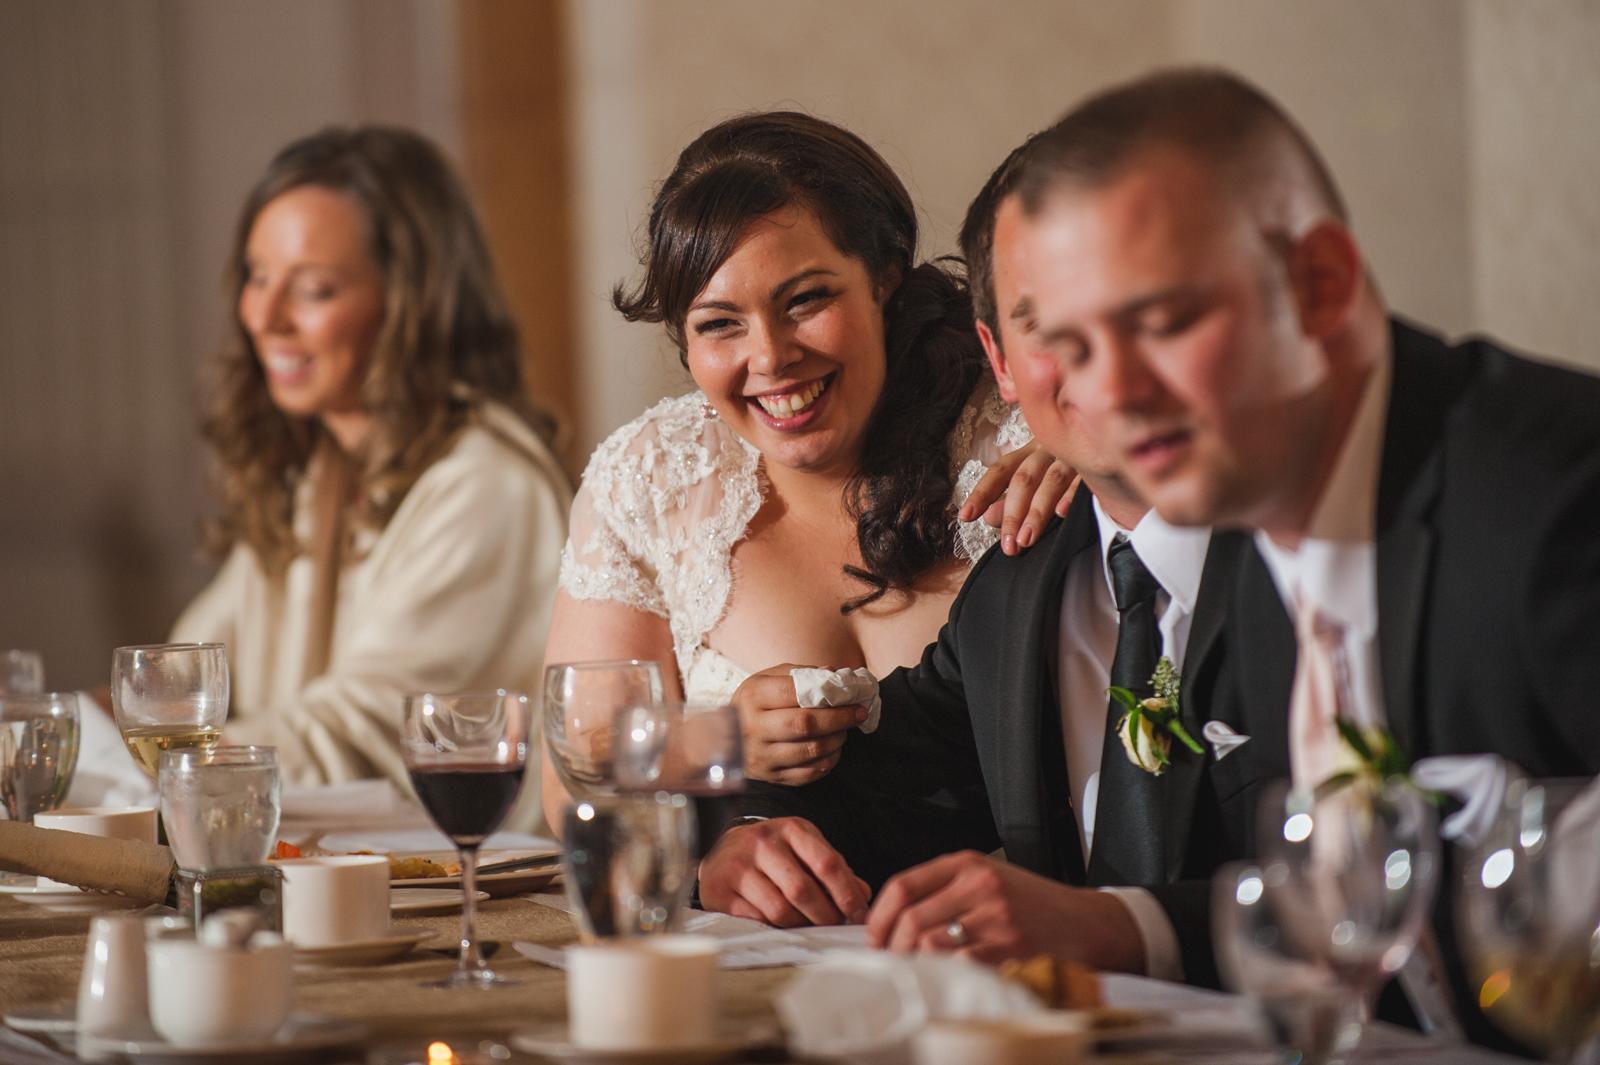 bc-wedding-photographers-harrison-lake-wedding-59.jpg